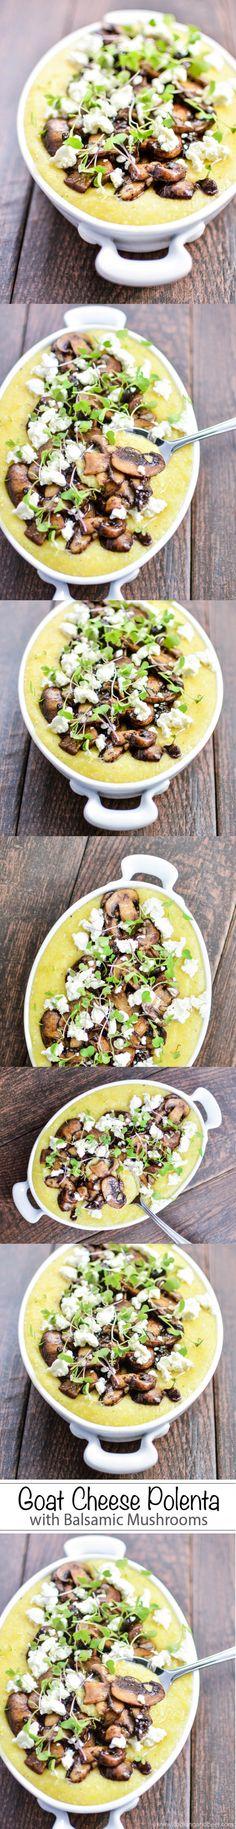 Ziegenkäse-Polenta mit Balsamico-Pilzen – #balsamico #pilzen #polenta #ziegenkase